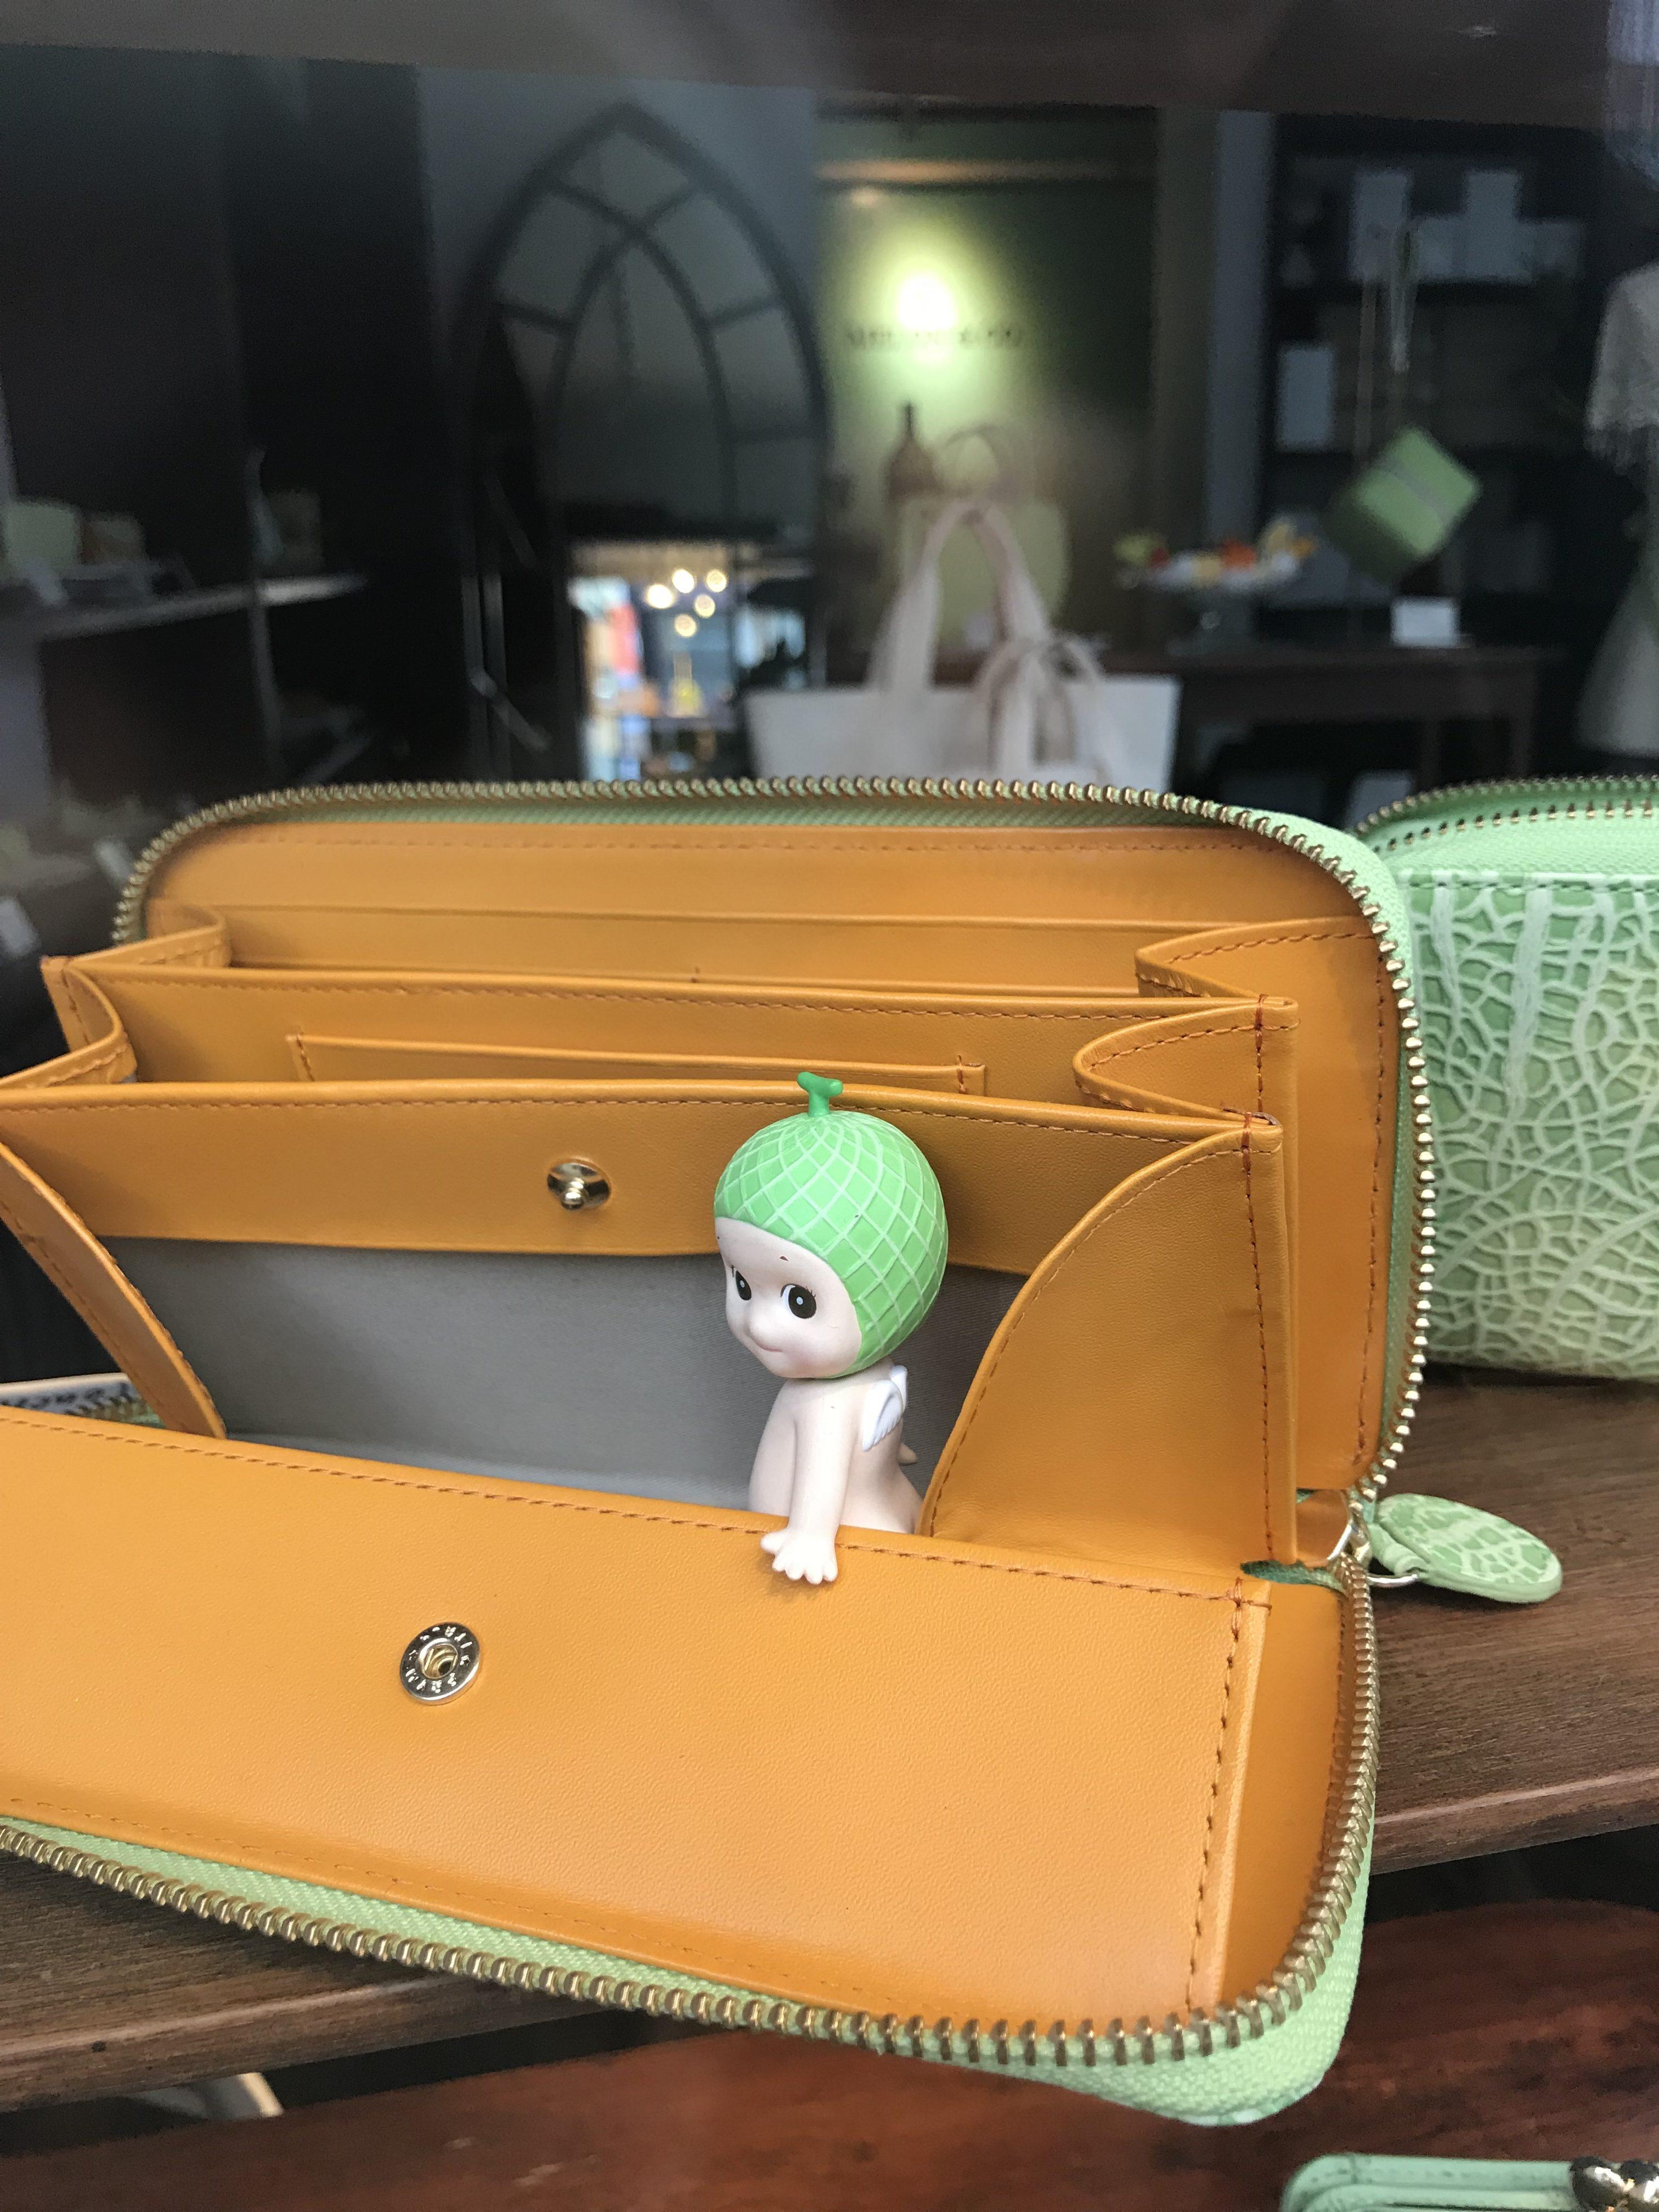 Tiny Rabbit Hole – Fabric Street Keito yarn cloth sewing haberdashery leather knitting crochet ribbons zips hooks